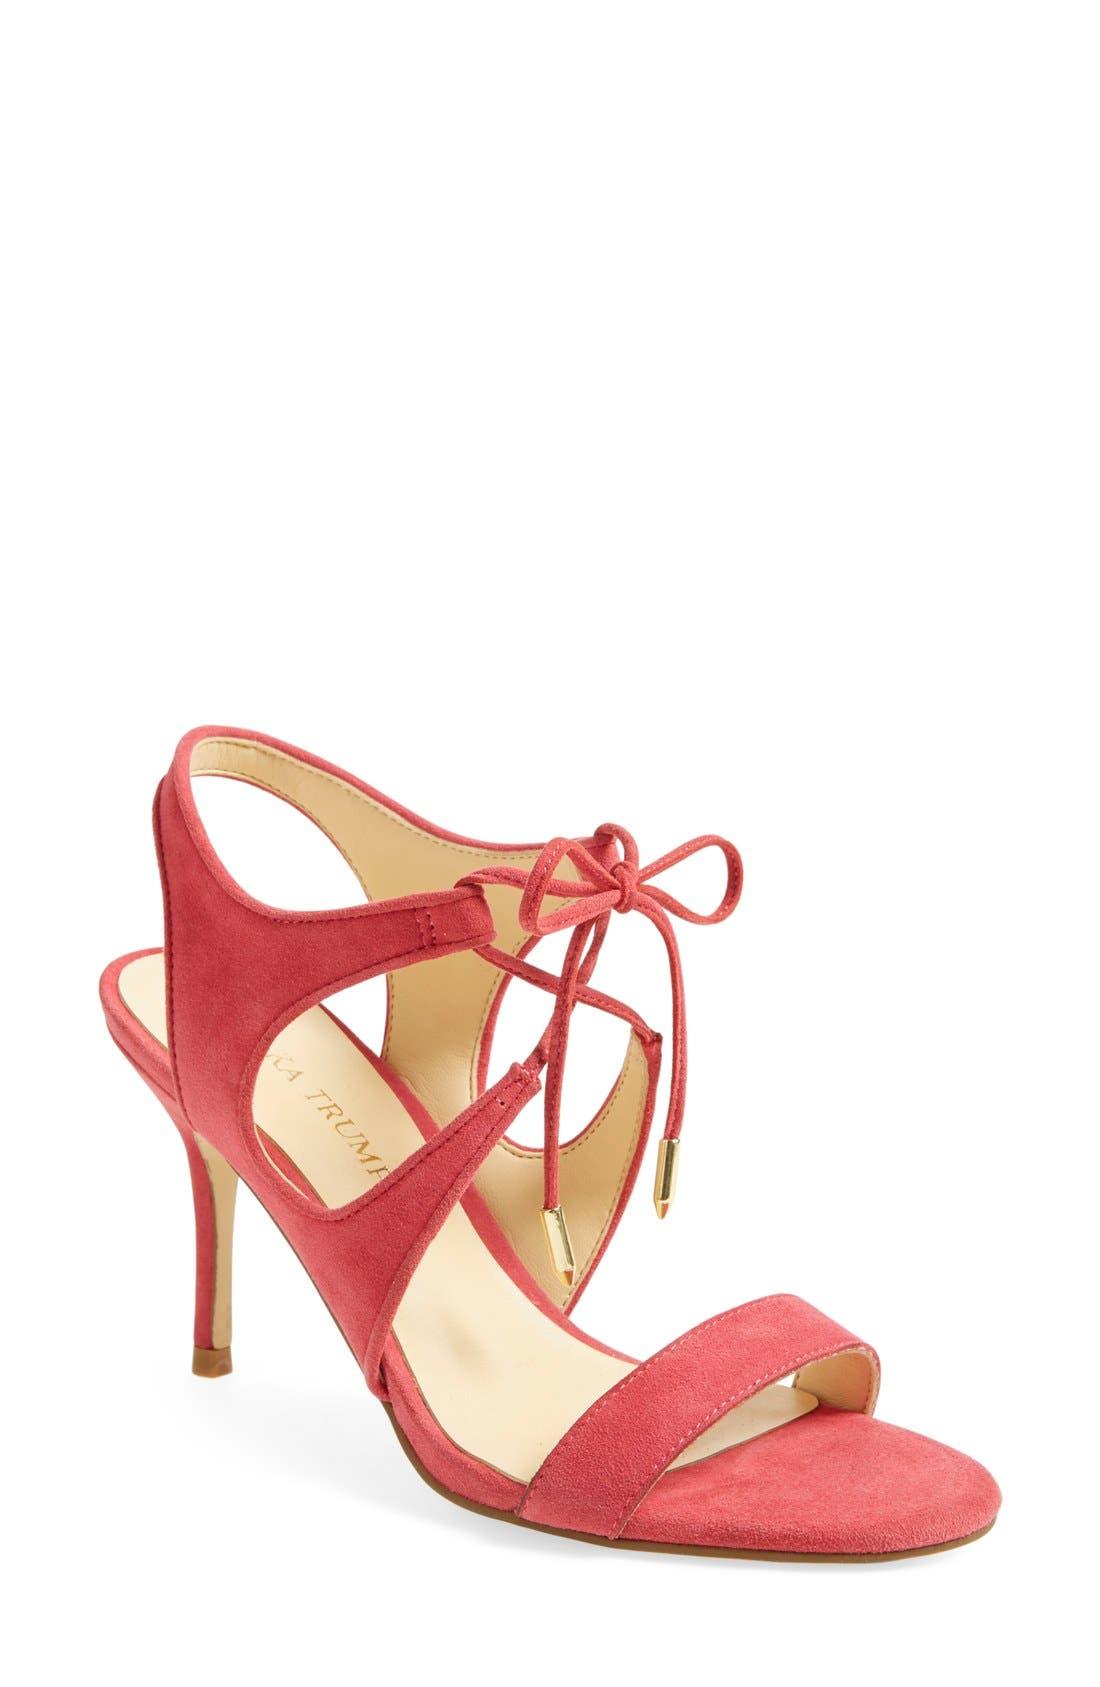 Alternate Image 1 Selected - Ivanka Trump 'Garver' Sandal (Women)